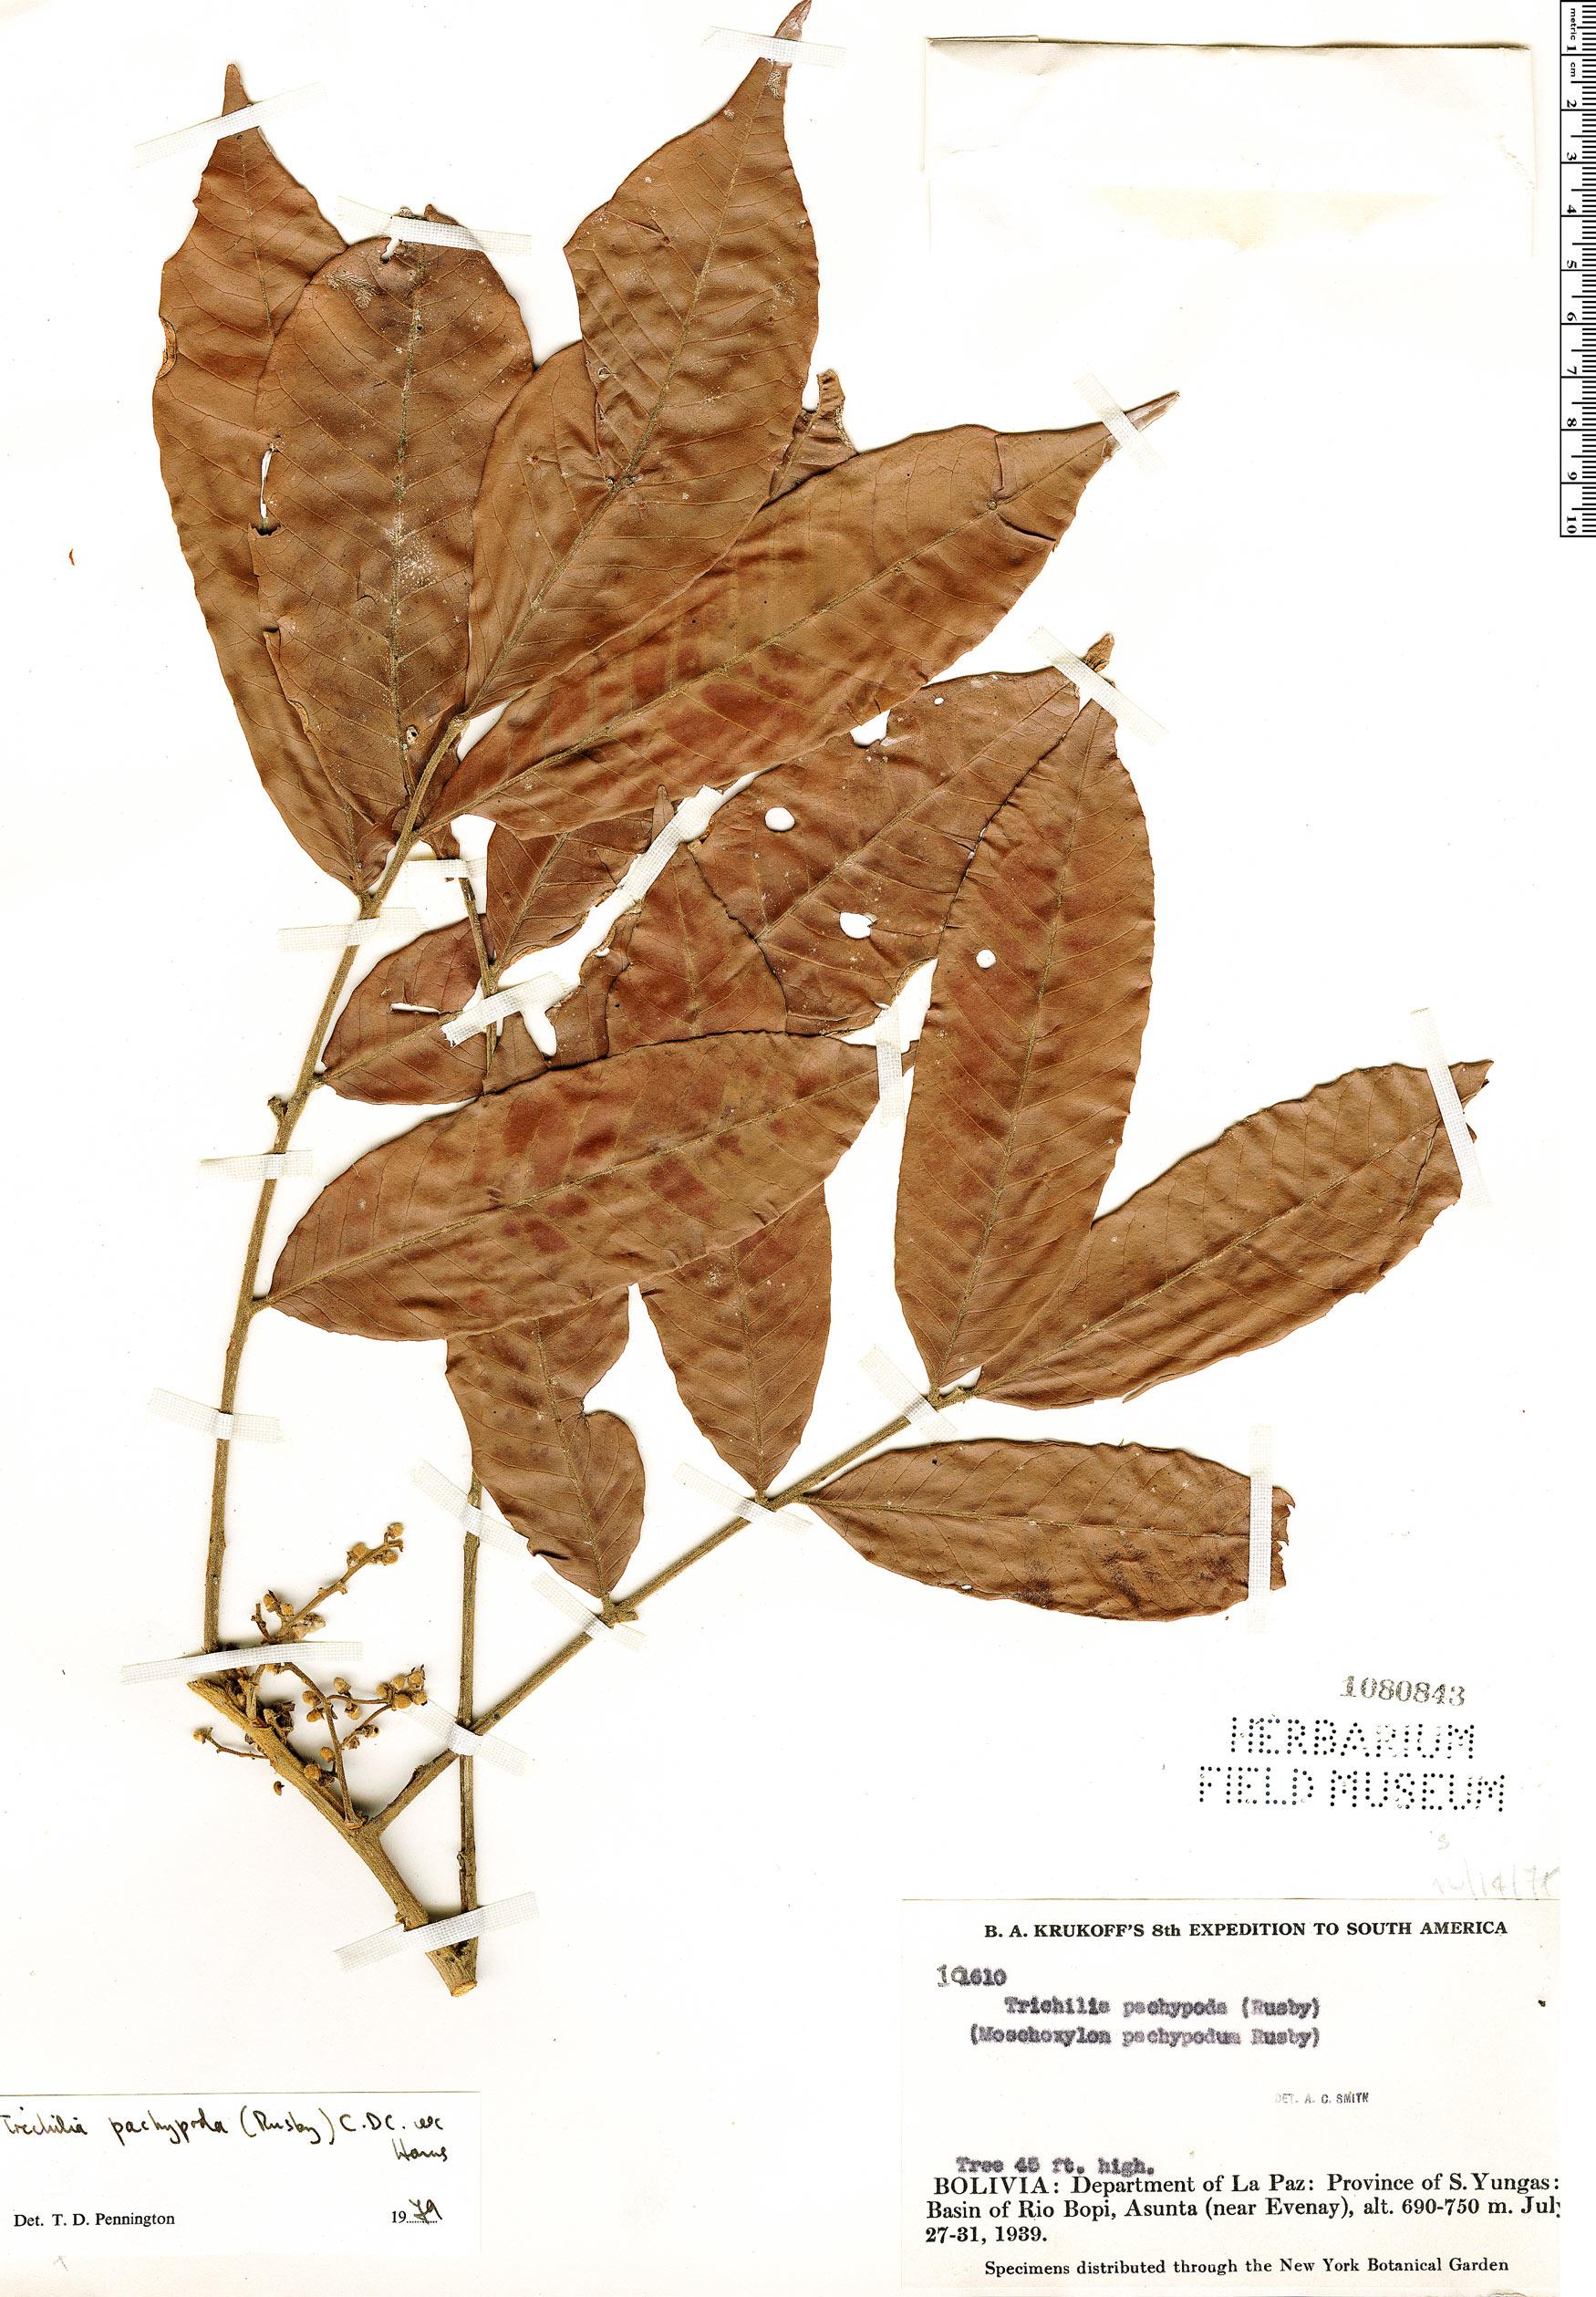 Specimen: Trichilia pachypoda